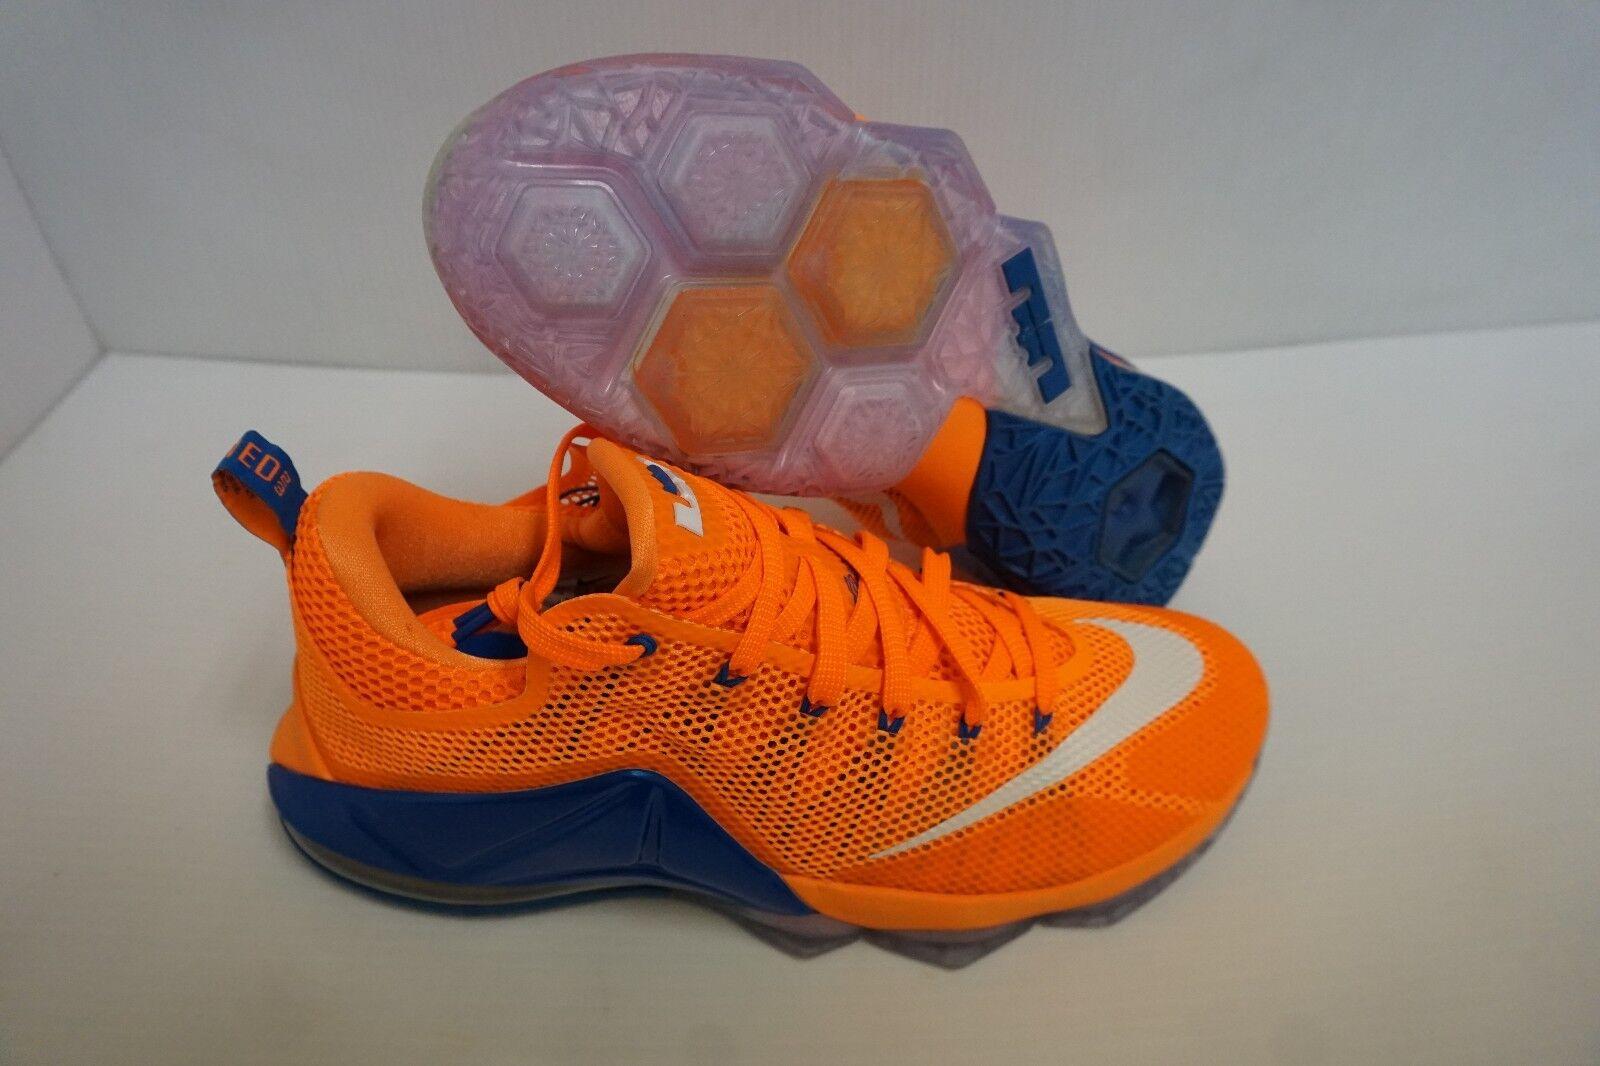 Nike Lebron xii low mens basketball basketball basketball scarpe bright citrus Dimensione 9 us 67653a